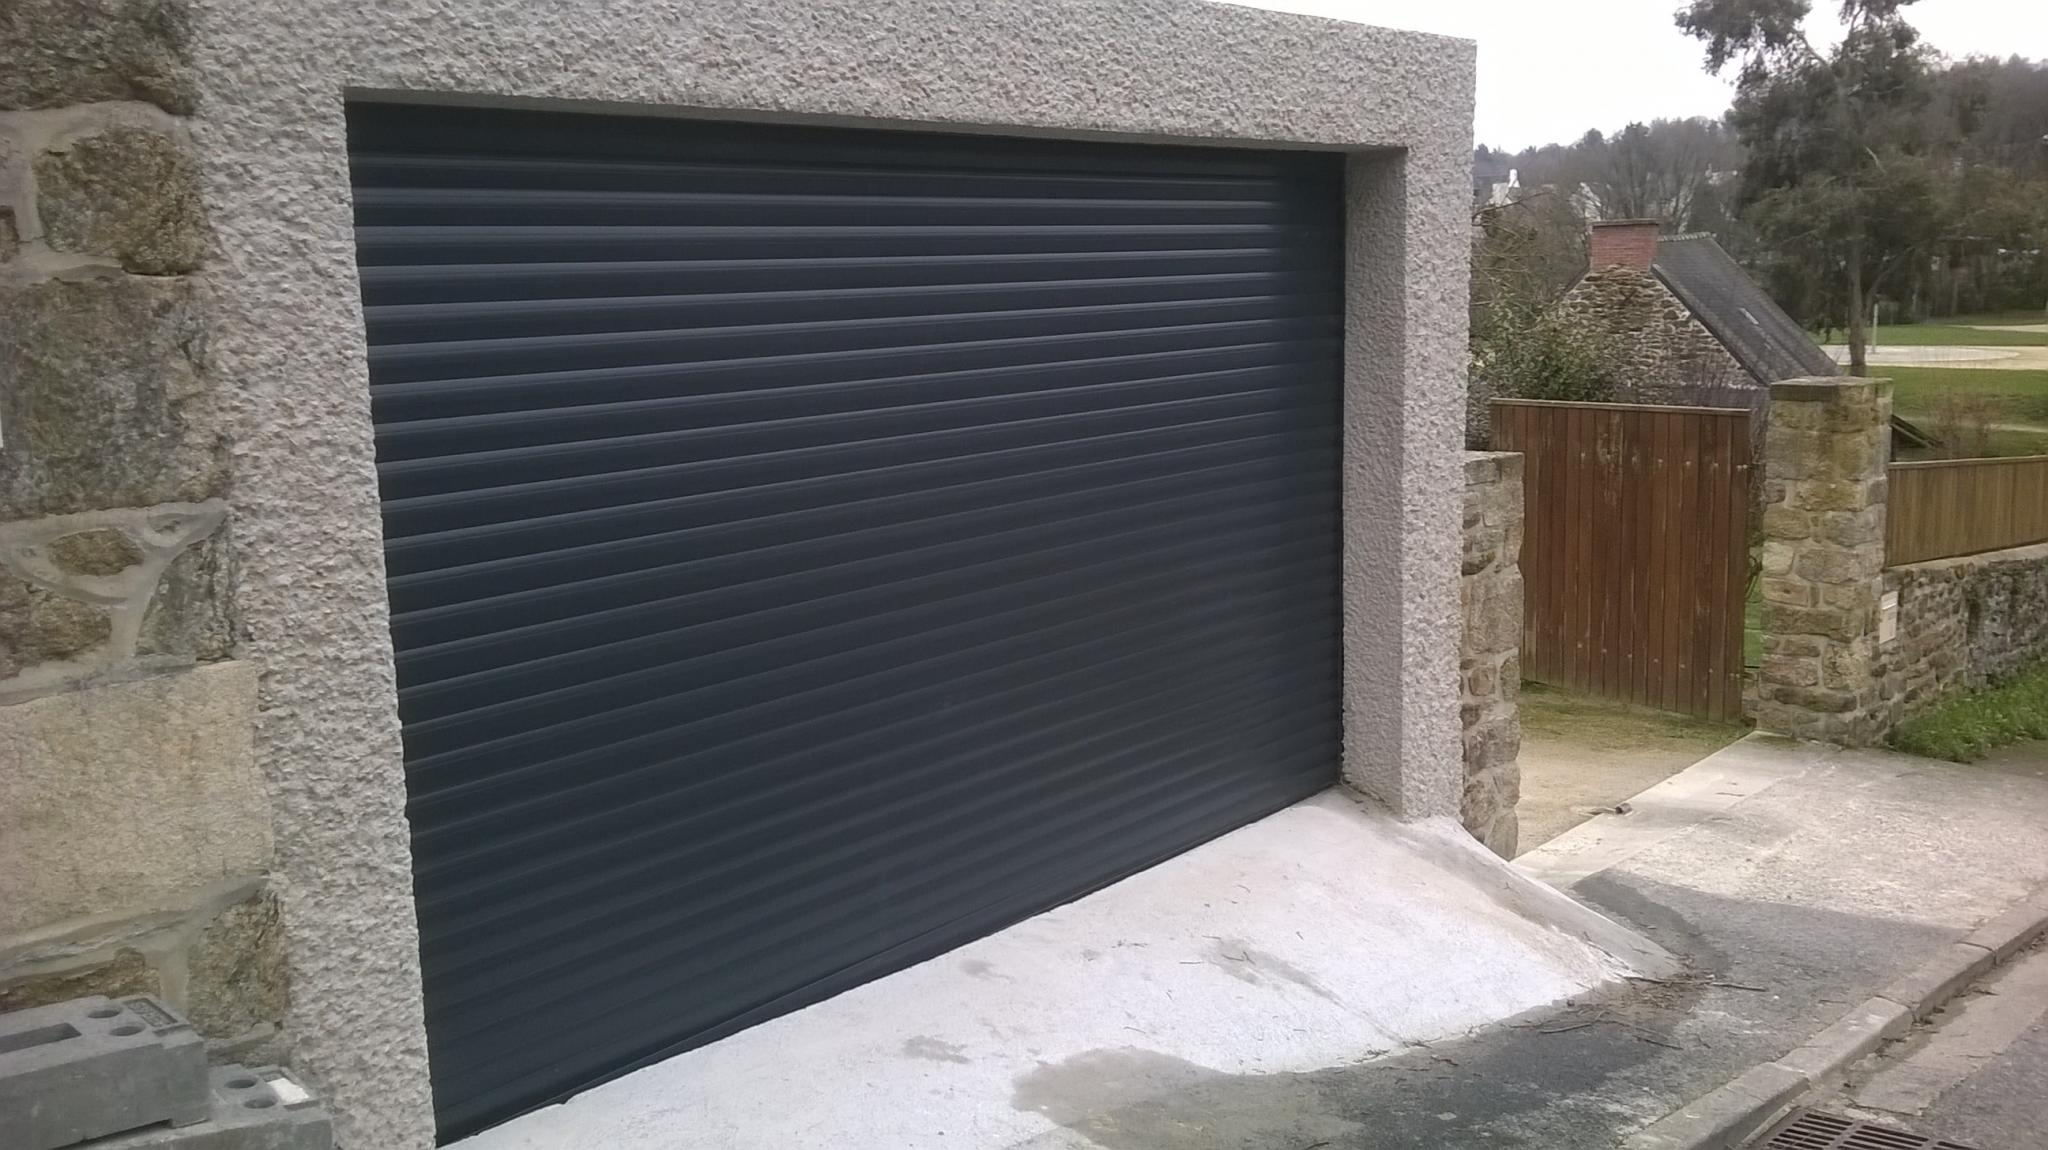 Porte enroulable install e par la menuiserie bouan for Pose porte garage enroulable